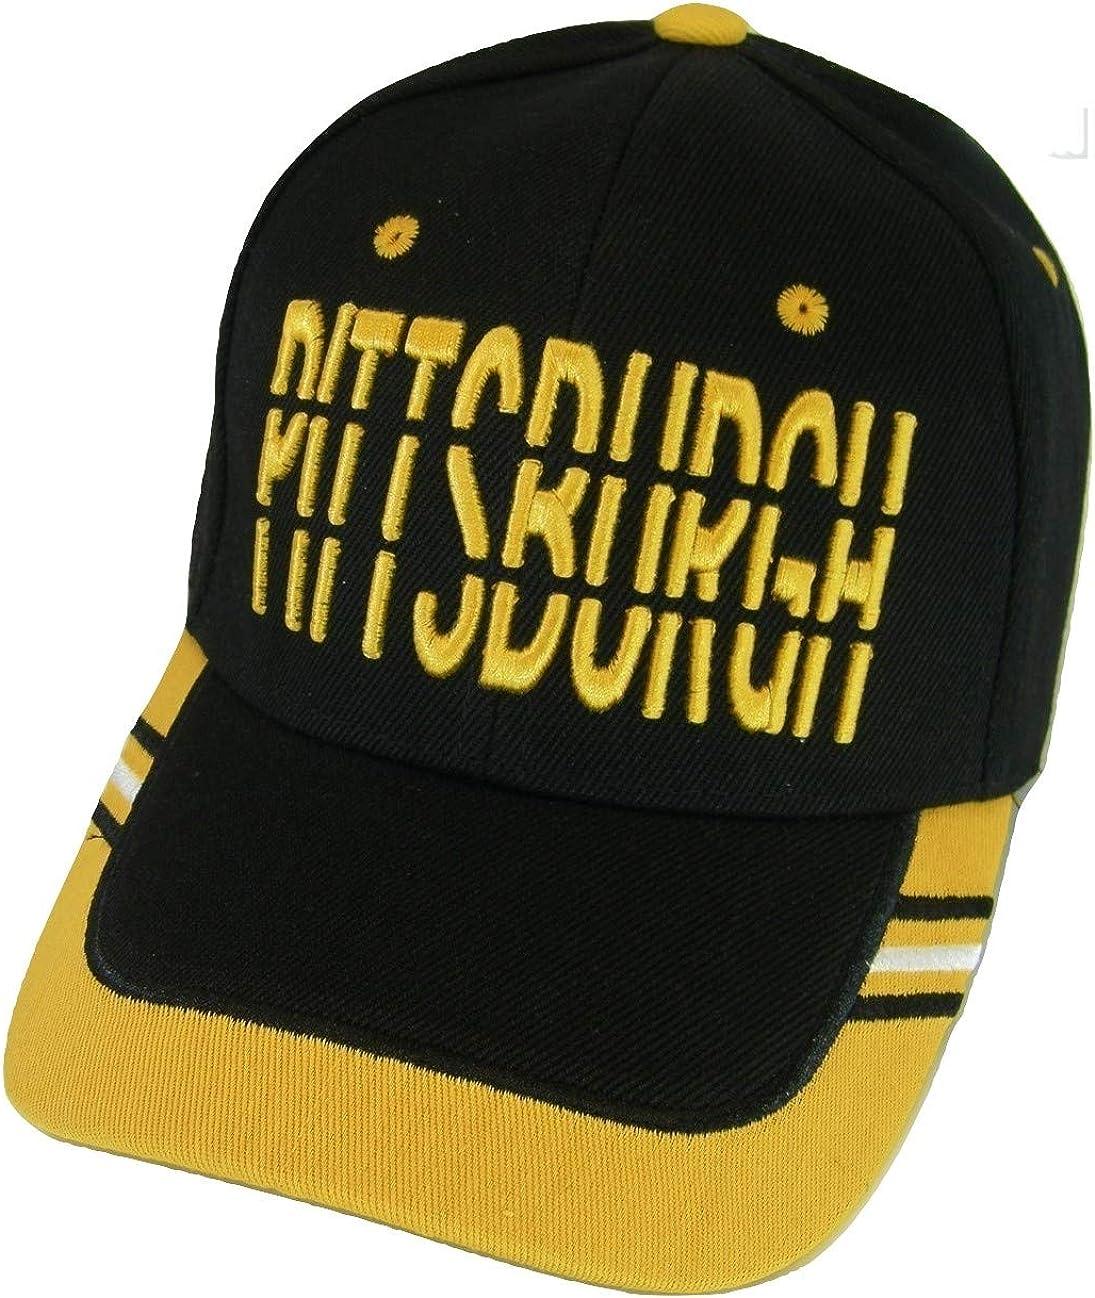 Pittsburgh Window Shade Font Men's Adjustable Baseball Cap